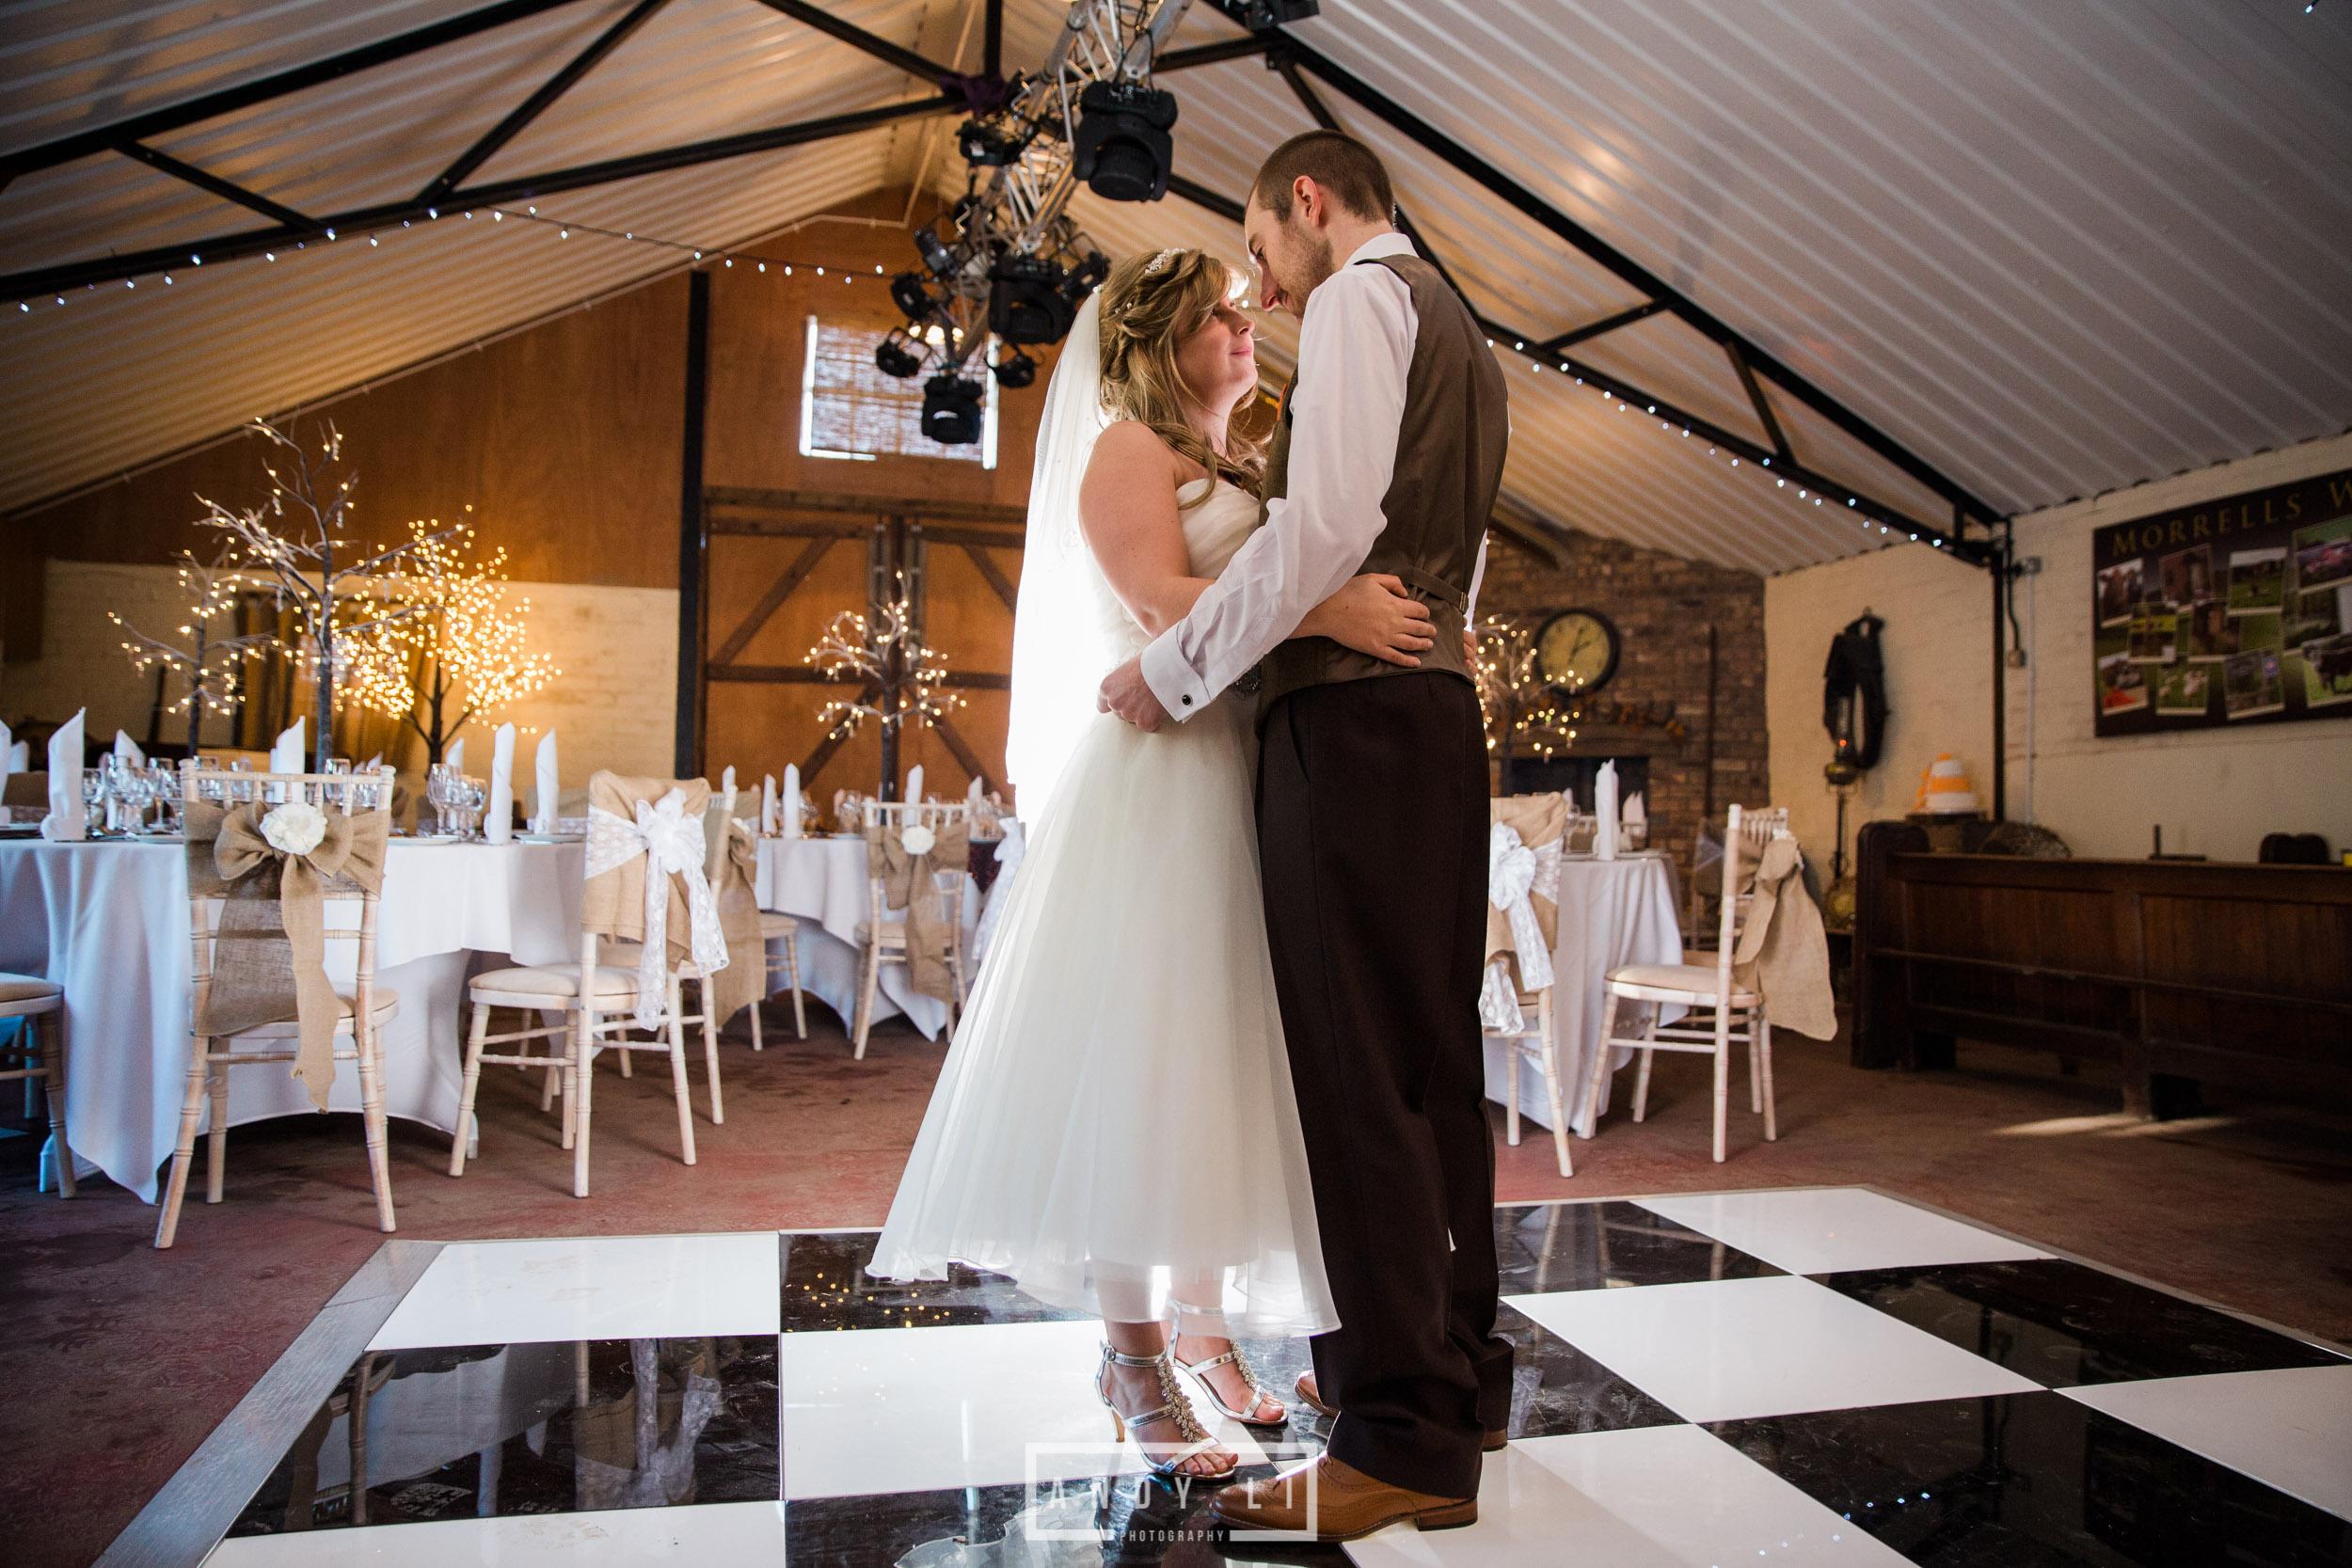 Morrells Wood Farm Weddings-141.jpg